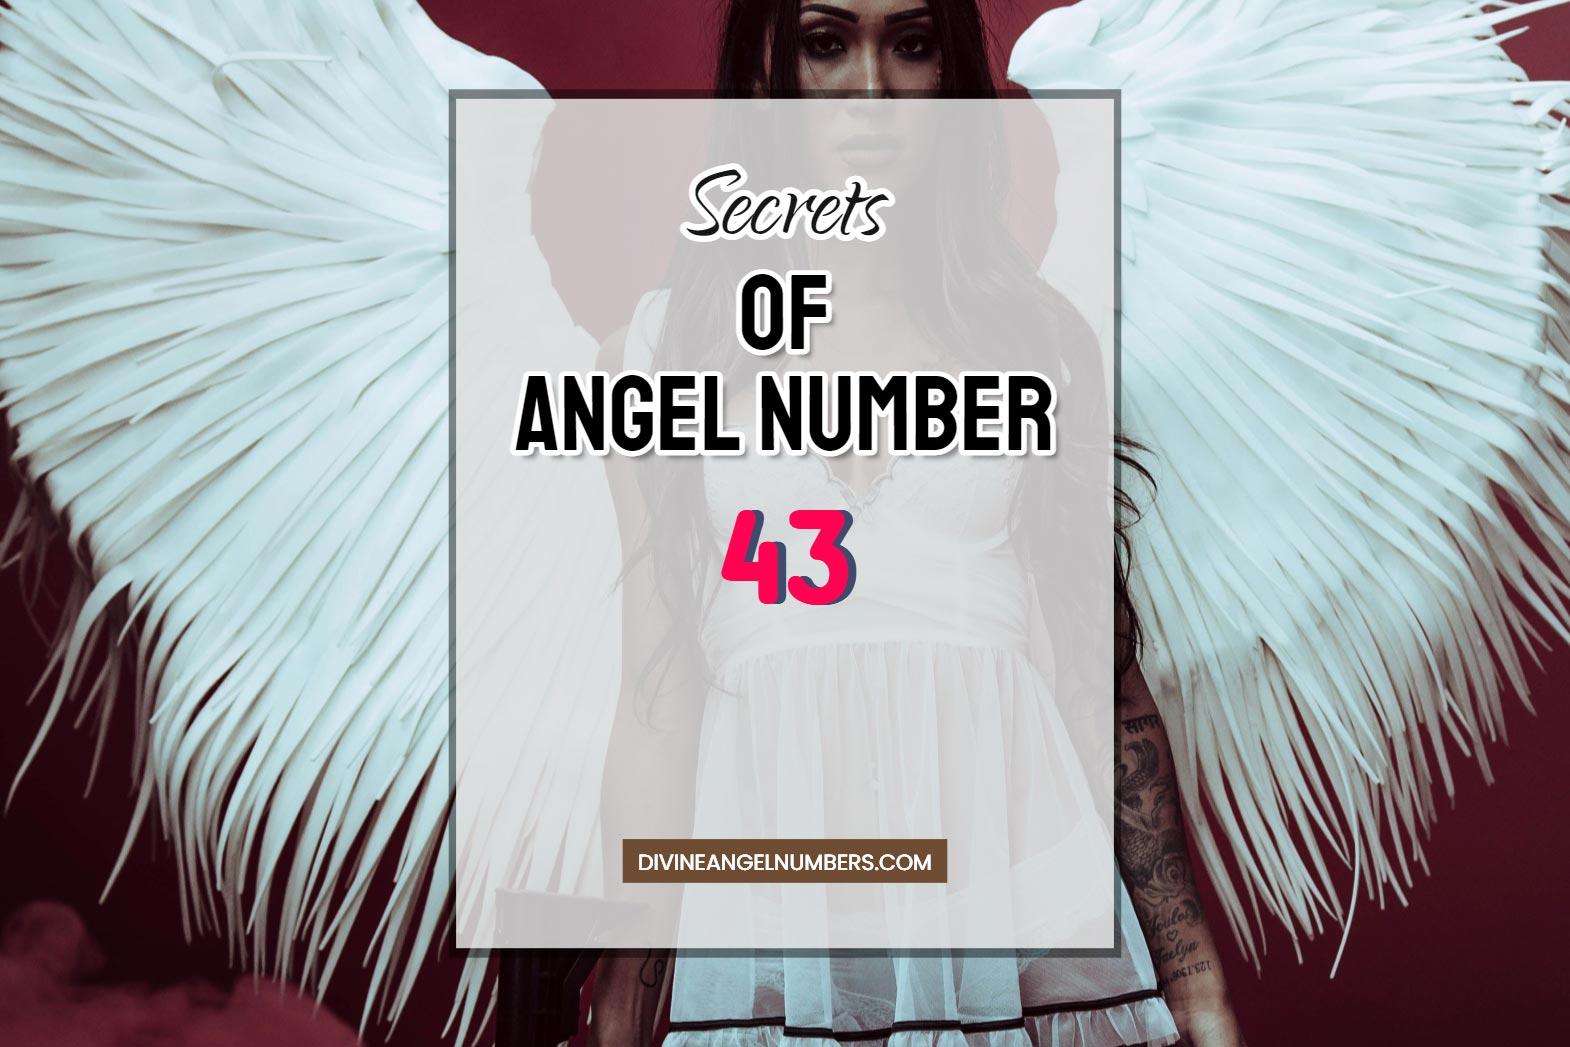 43 Angel Number: Meaning & Symbolism